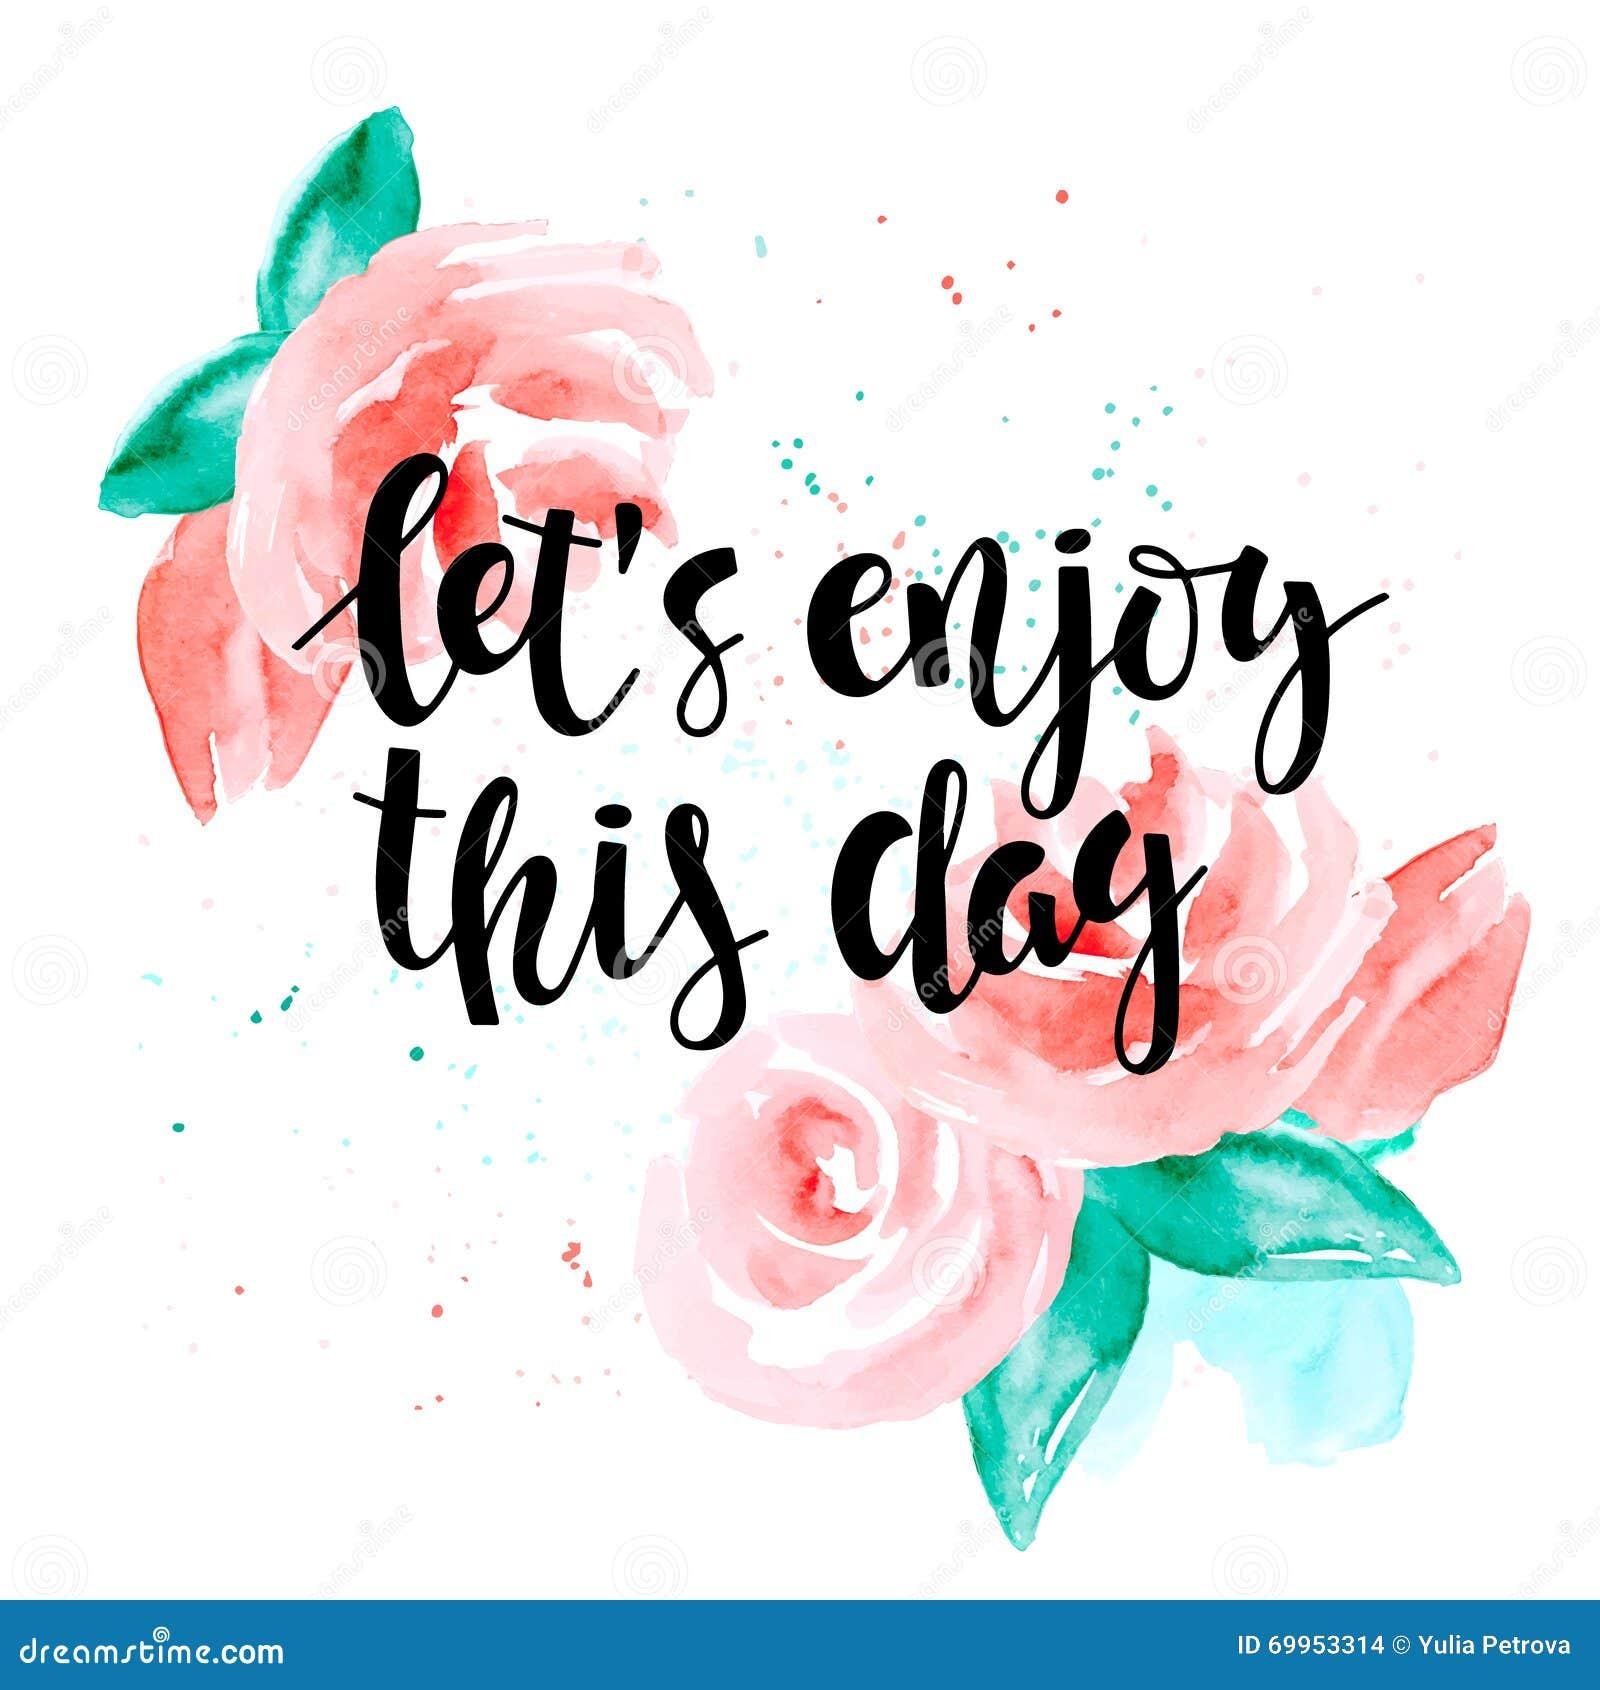 enjoy life everyday quotes